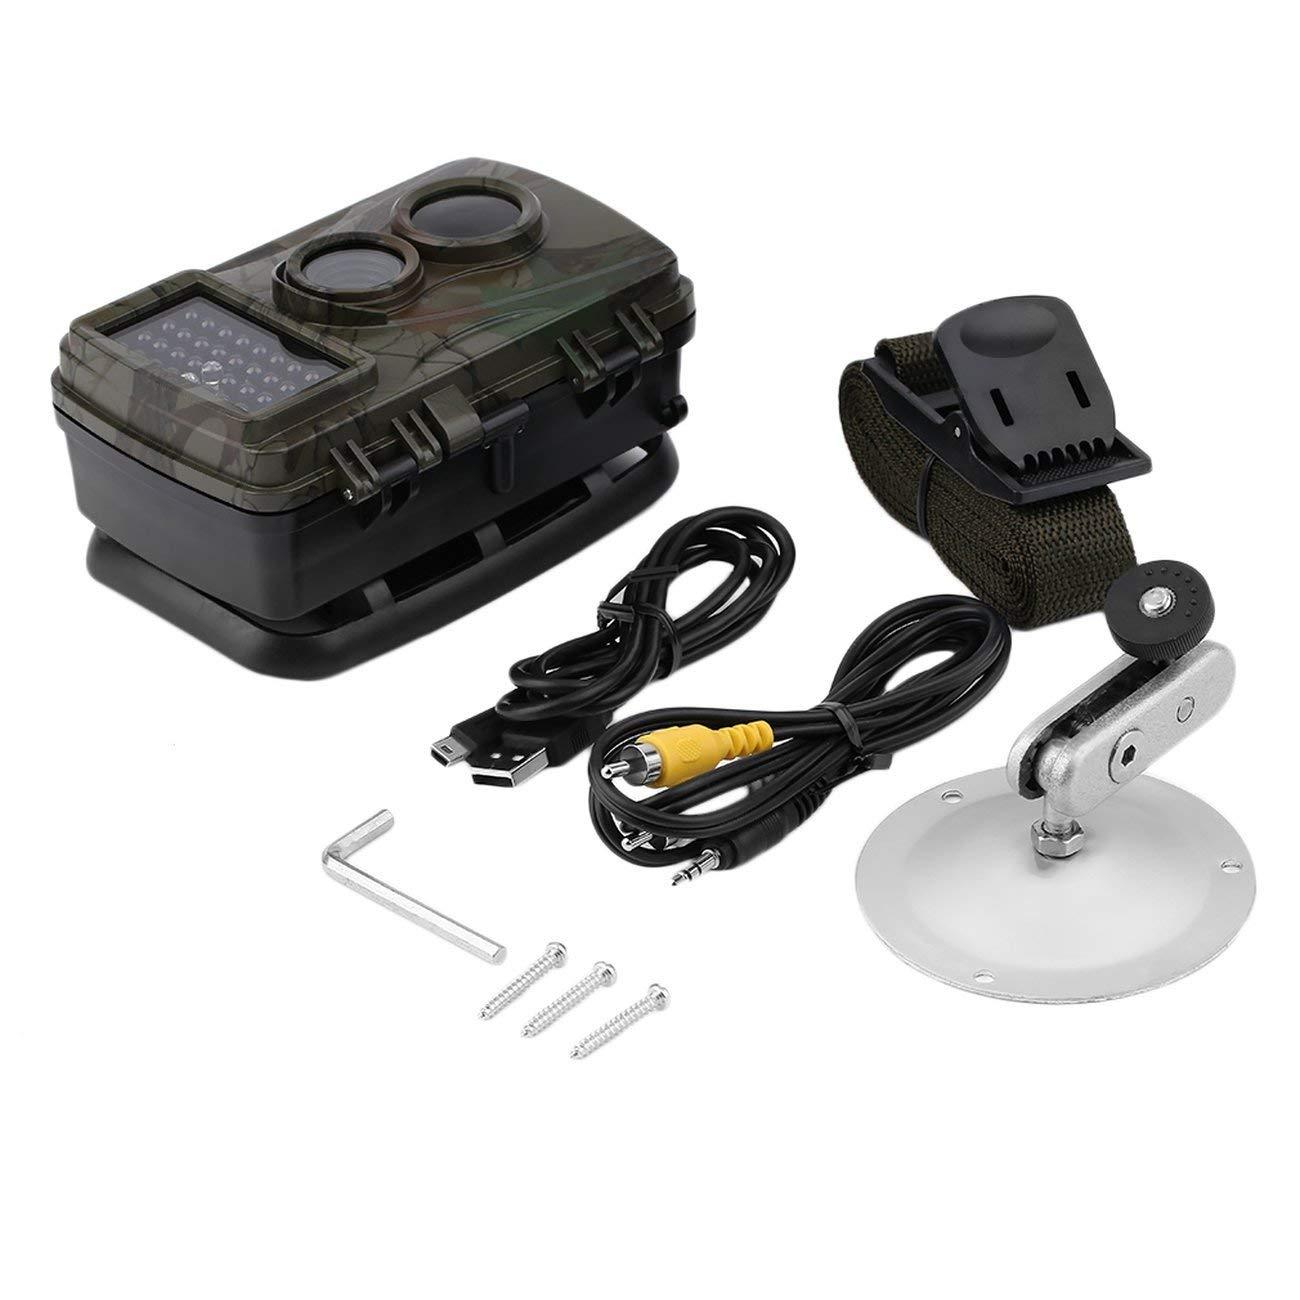 SH-50 E-PM1 E-P5 E-PL3 SP-720 E-M5 SP-820 E-5 E-PL5 E-PM2 Opteka LTX80-O Lightning//Gunshot//Fireworks /& Motion Sensor//Security//Wildlife Trigger for Olympus SP-620 XZ-2 Cameras